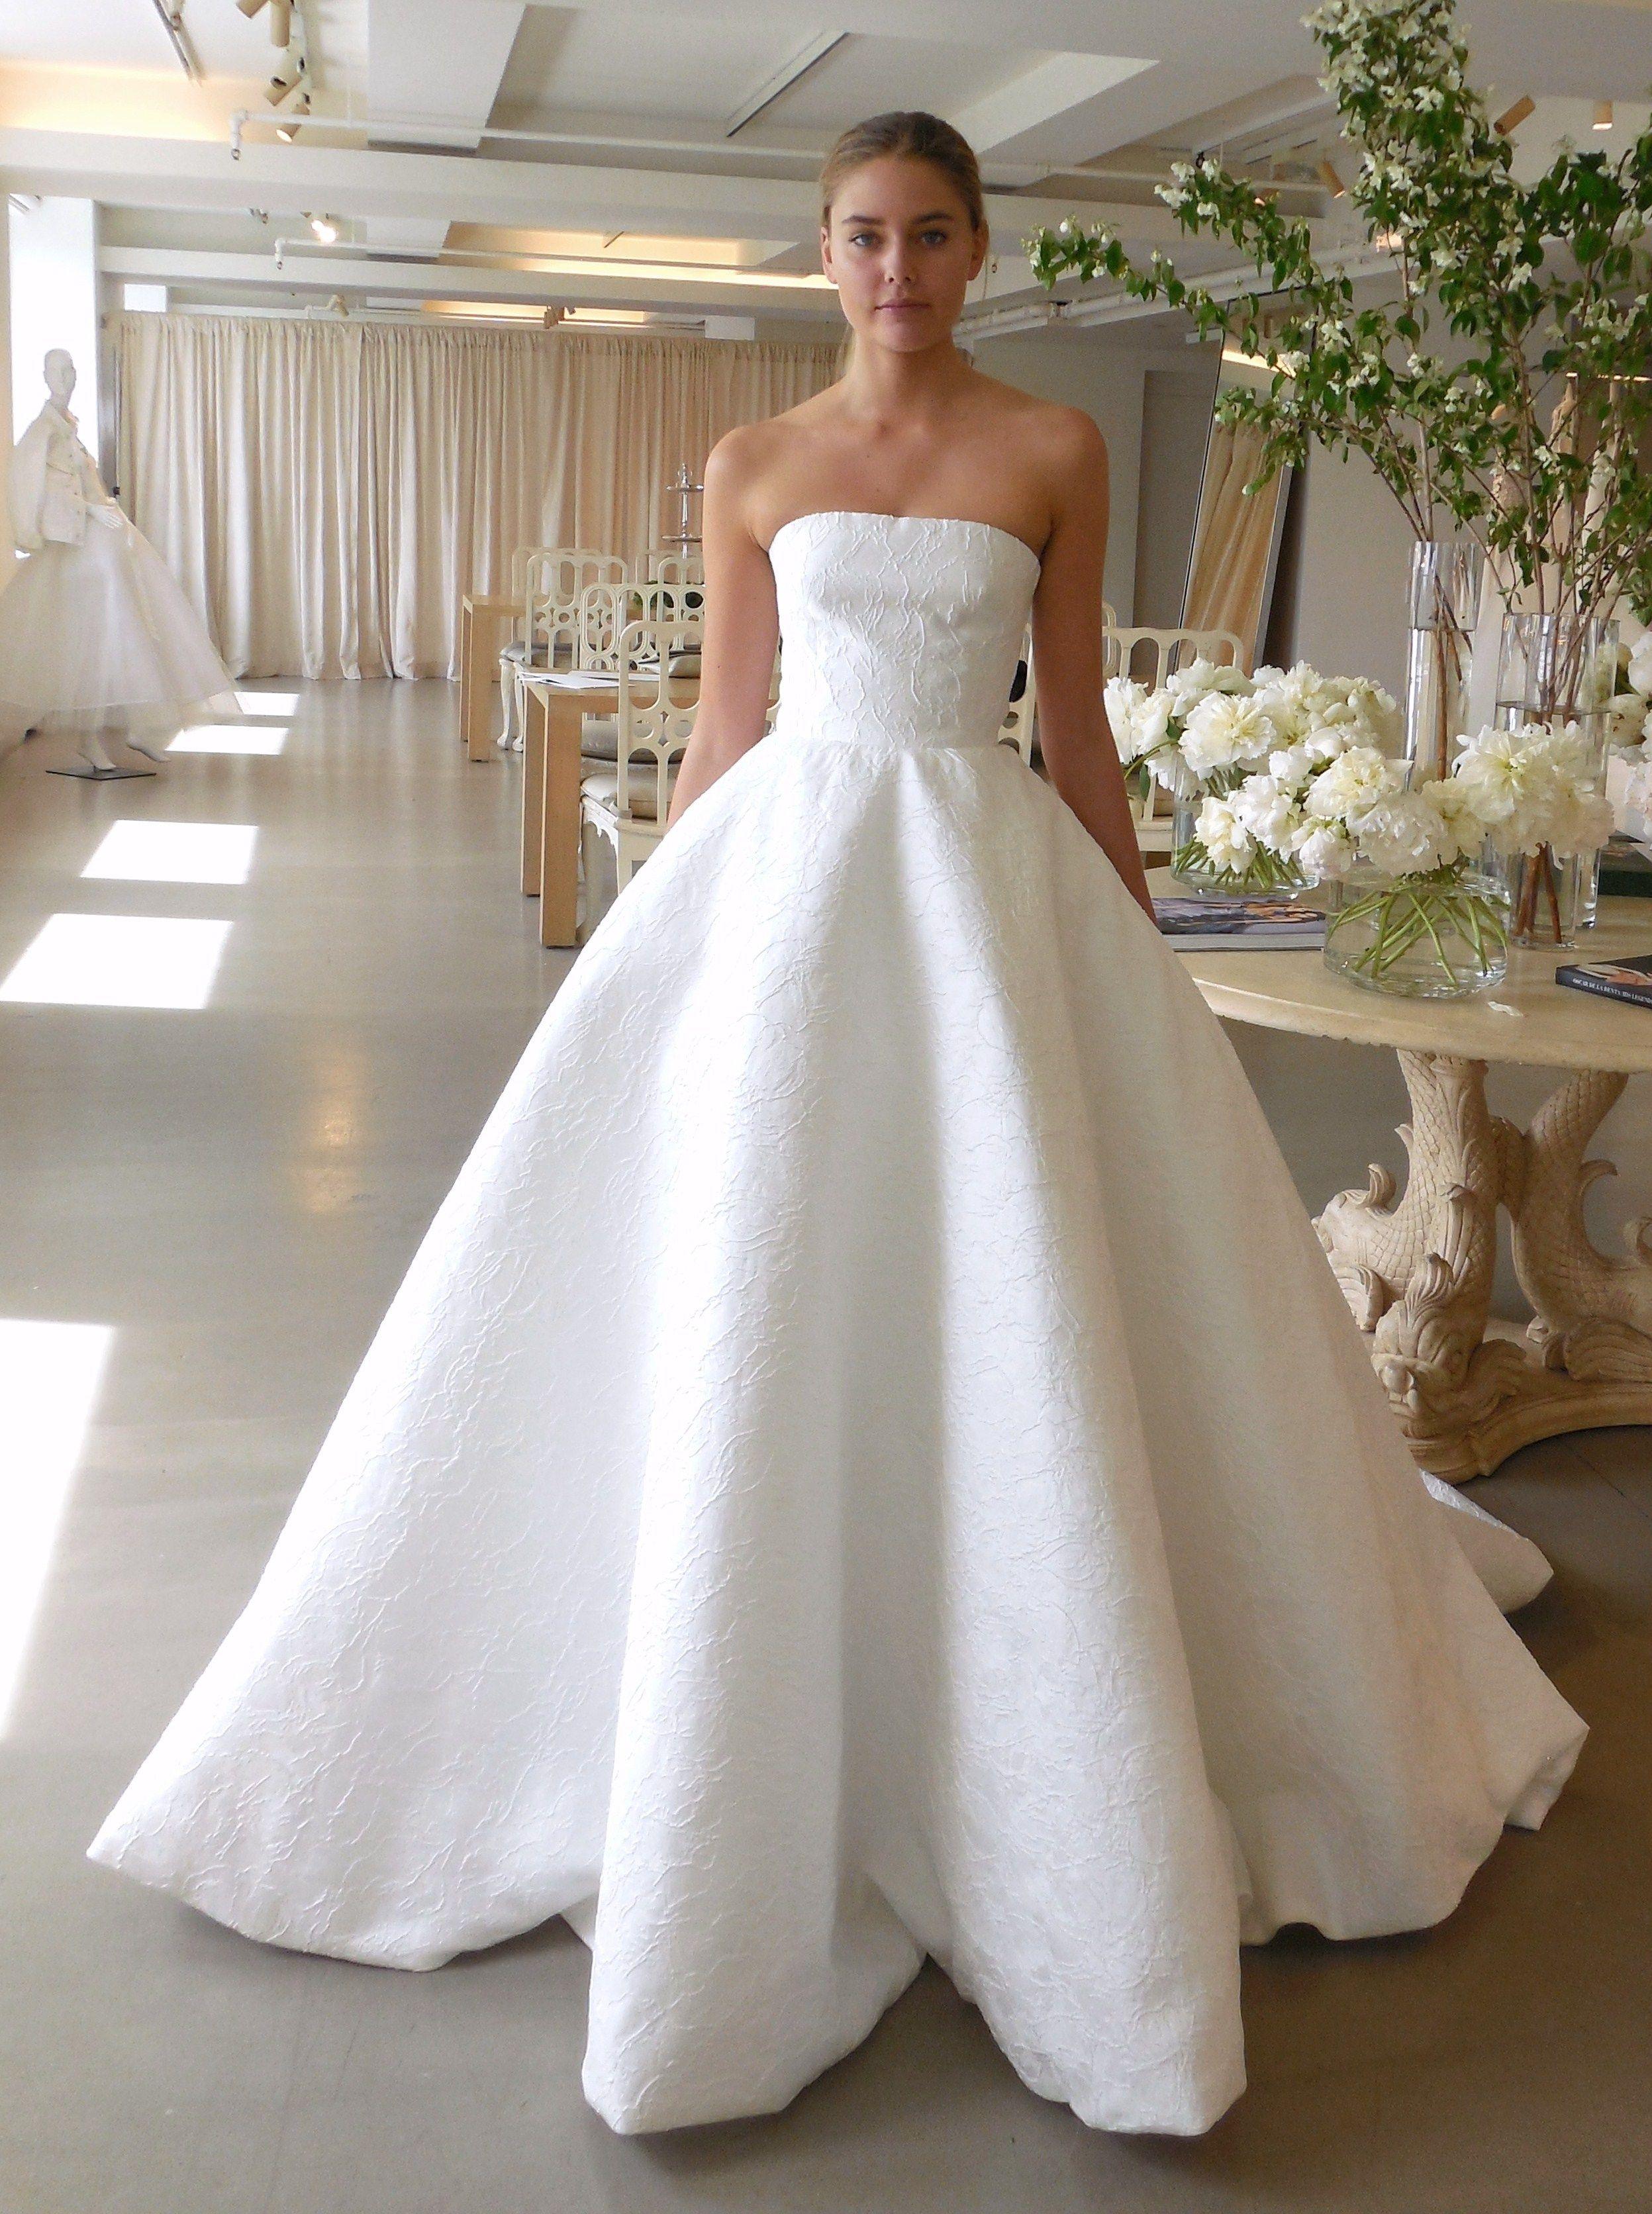 b6e030d6139 ... Goodman by Neiman Marcus. Buy Oscar de la Renta necklaces at  bergdorfgoodman.com. You Can Now See Amal Clooney s Oscar De La Renta Wedding  Dress ...